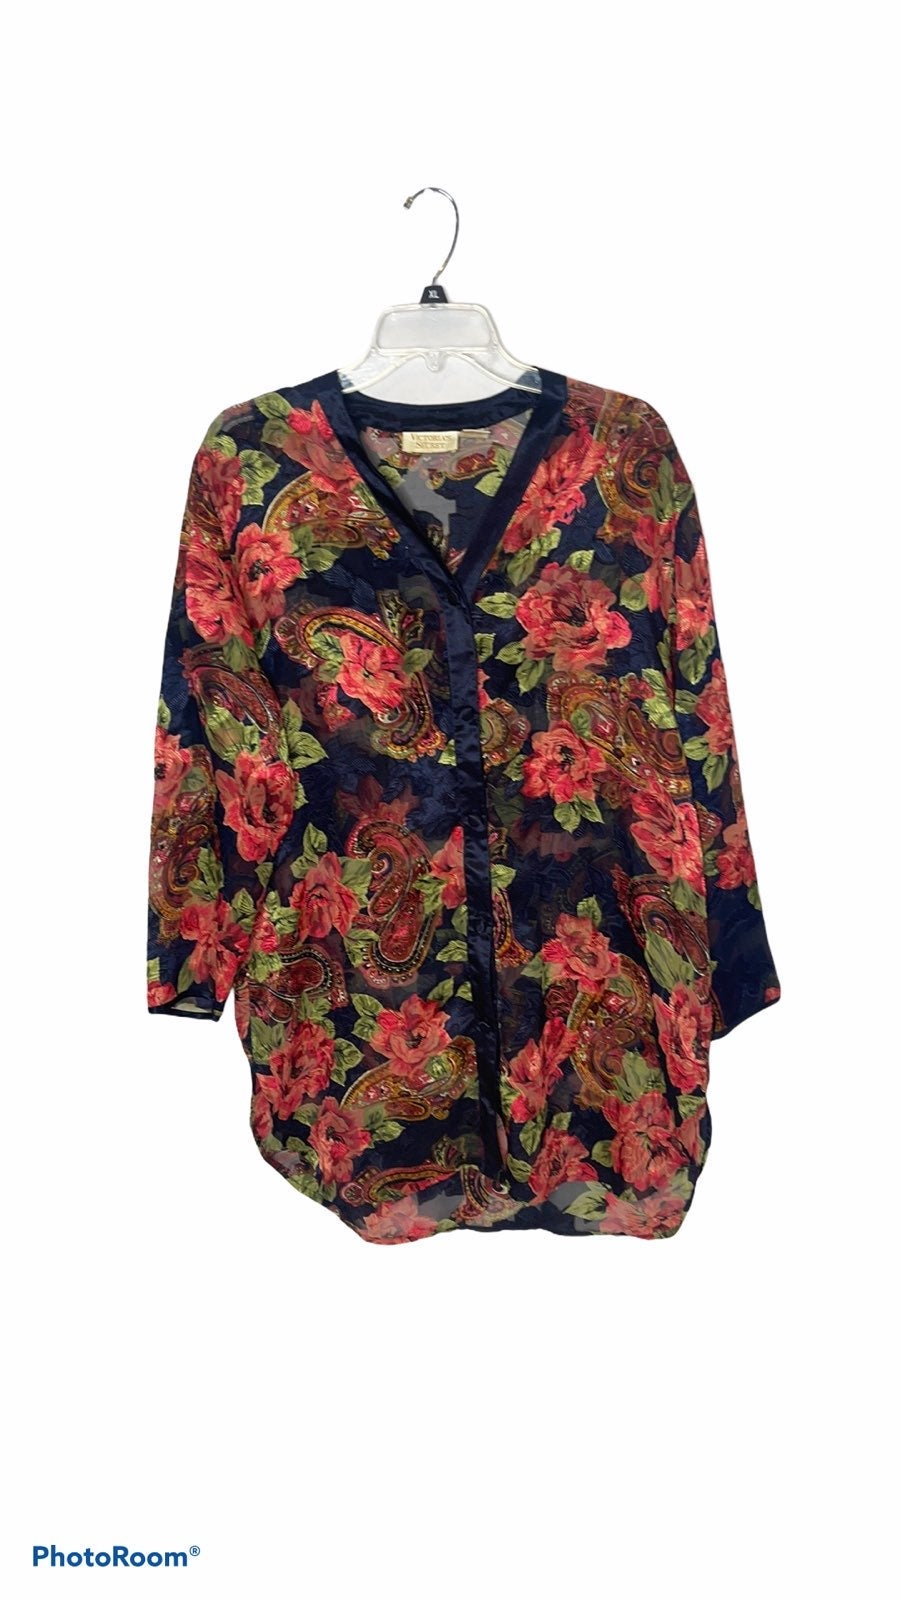 Victoria Secret Gold Label Pajama Shirt.